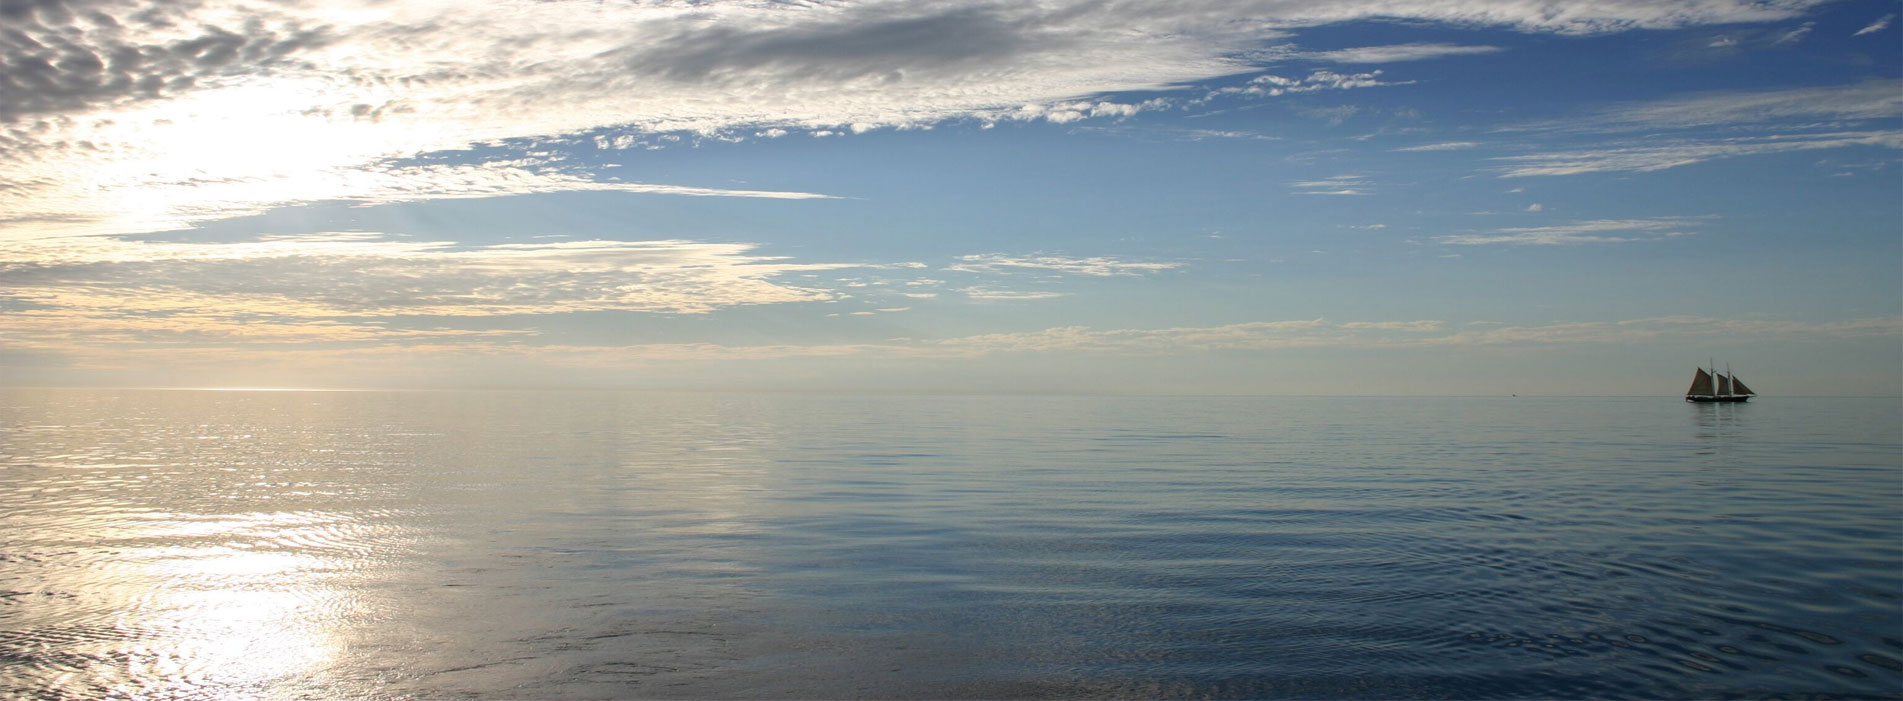 WILLIE-pearl-lugger-coastal-cruise